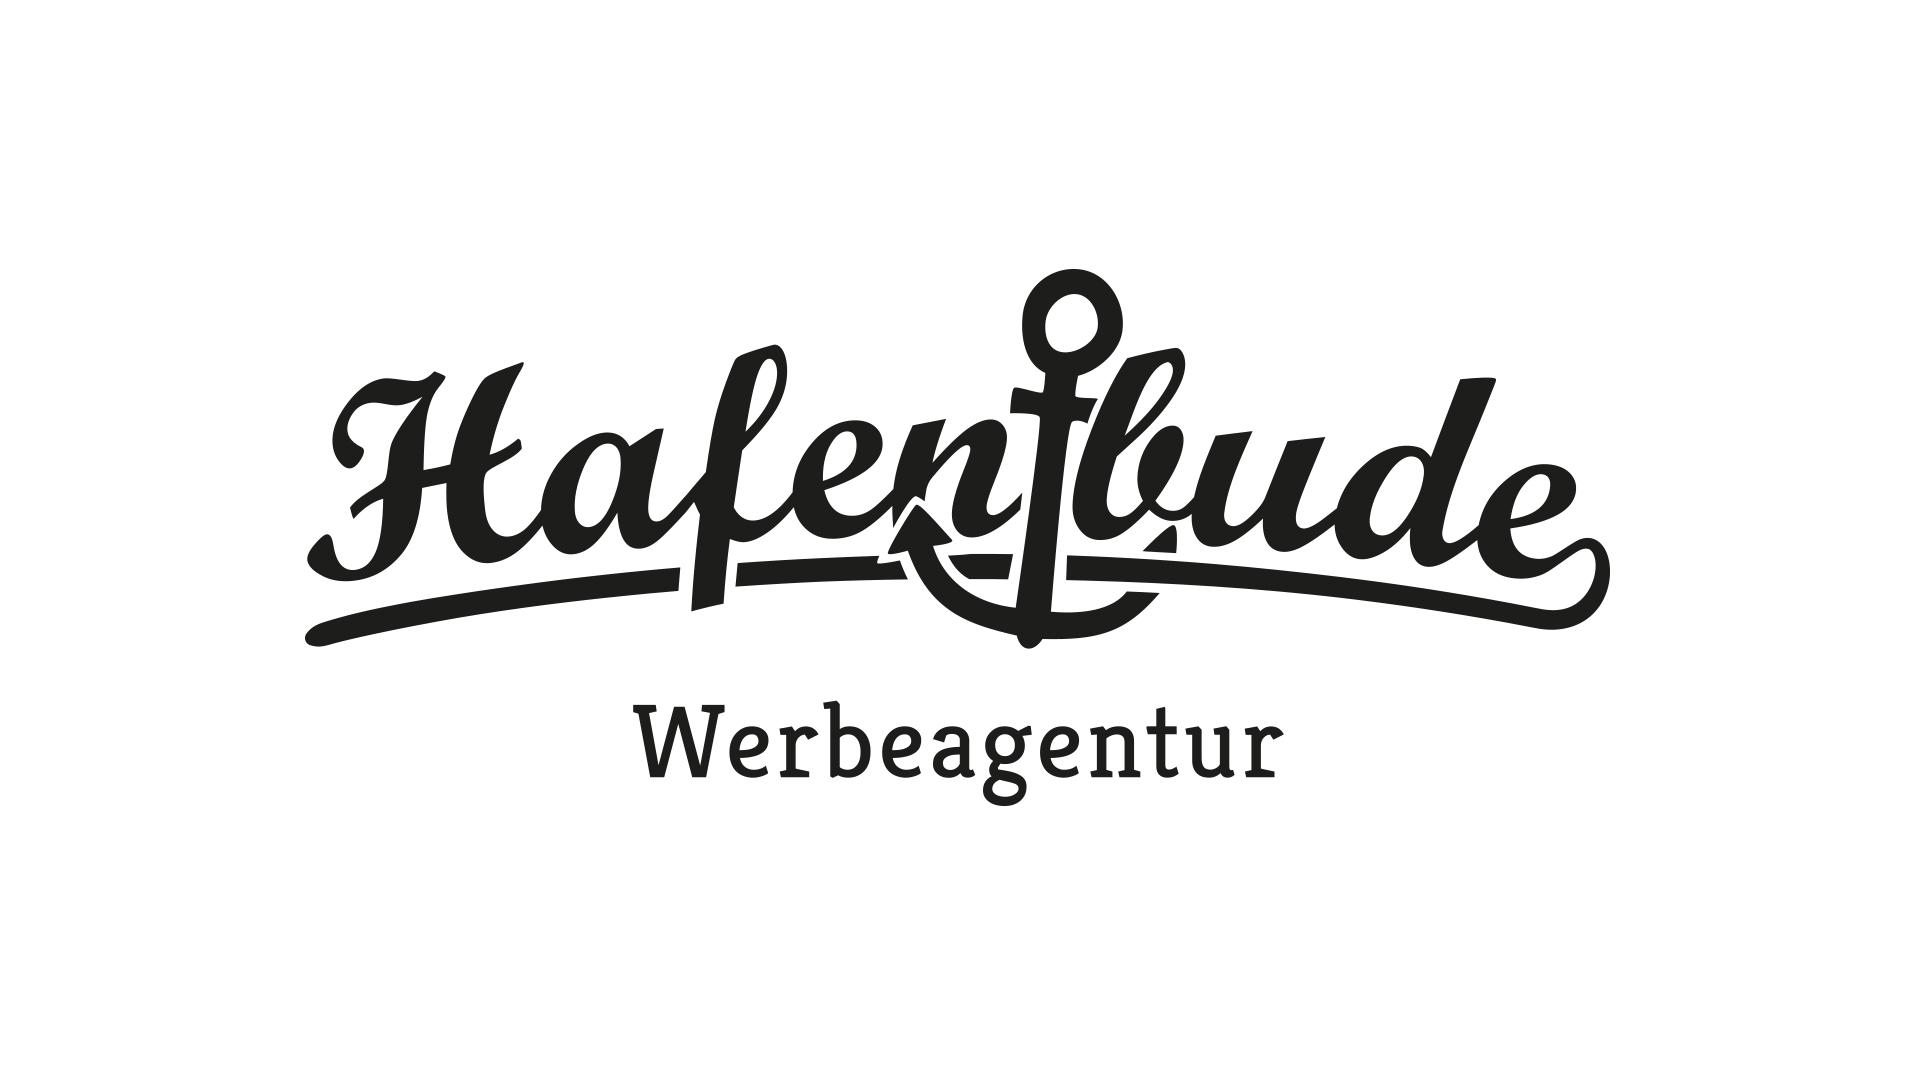 habu-logo.jpg – Hafenbude Werbeagentur GmbH